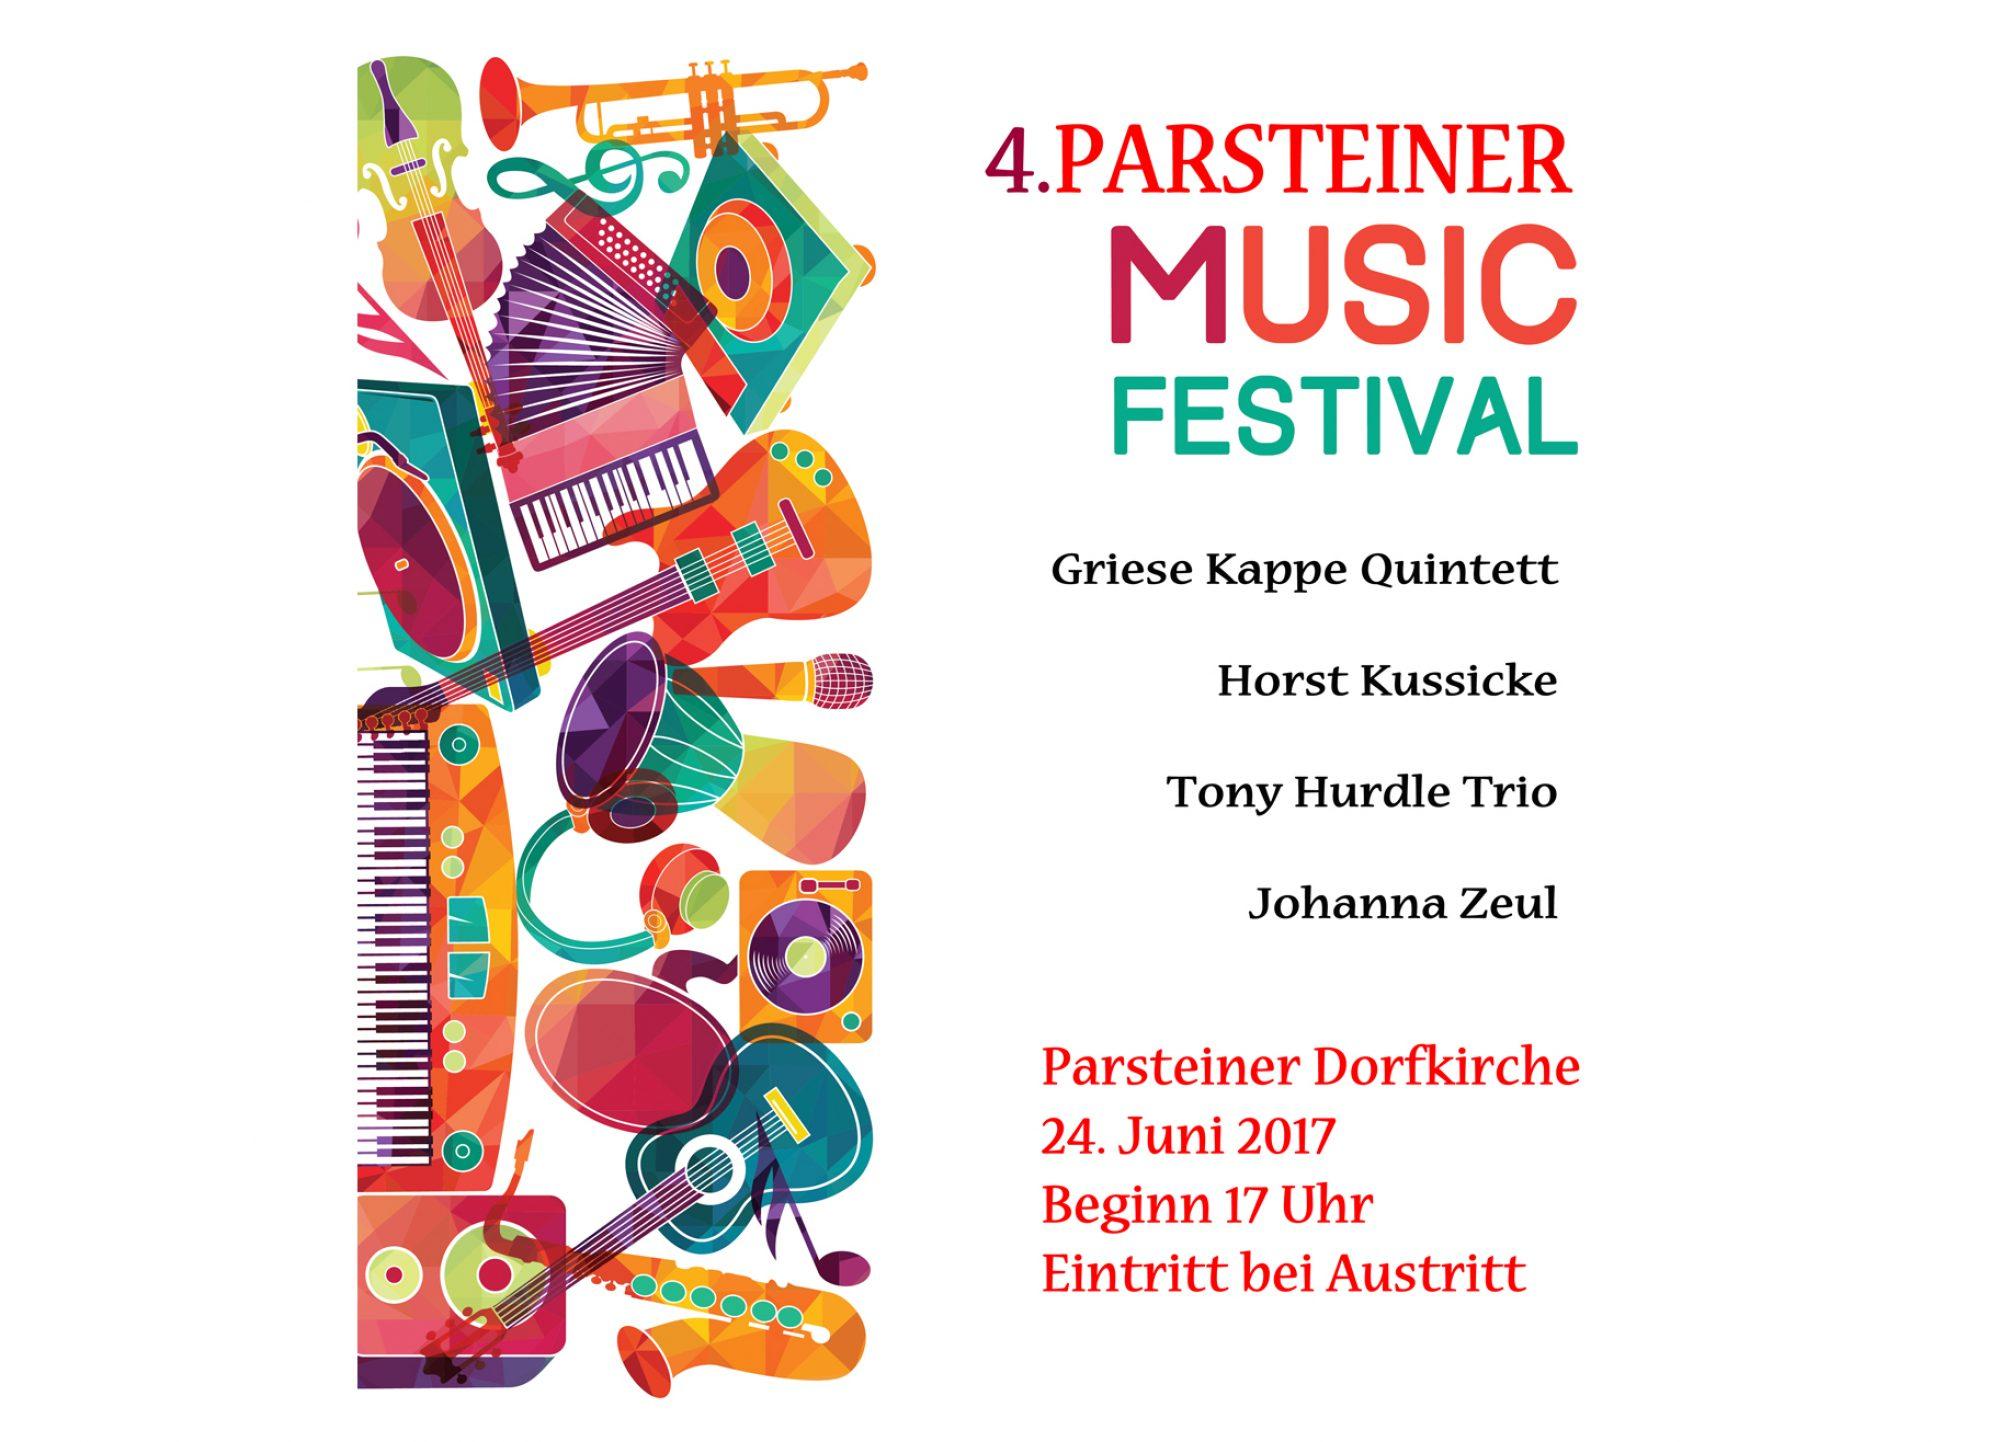 4. parsteiner musik festival